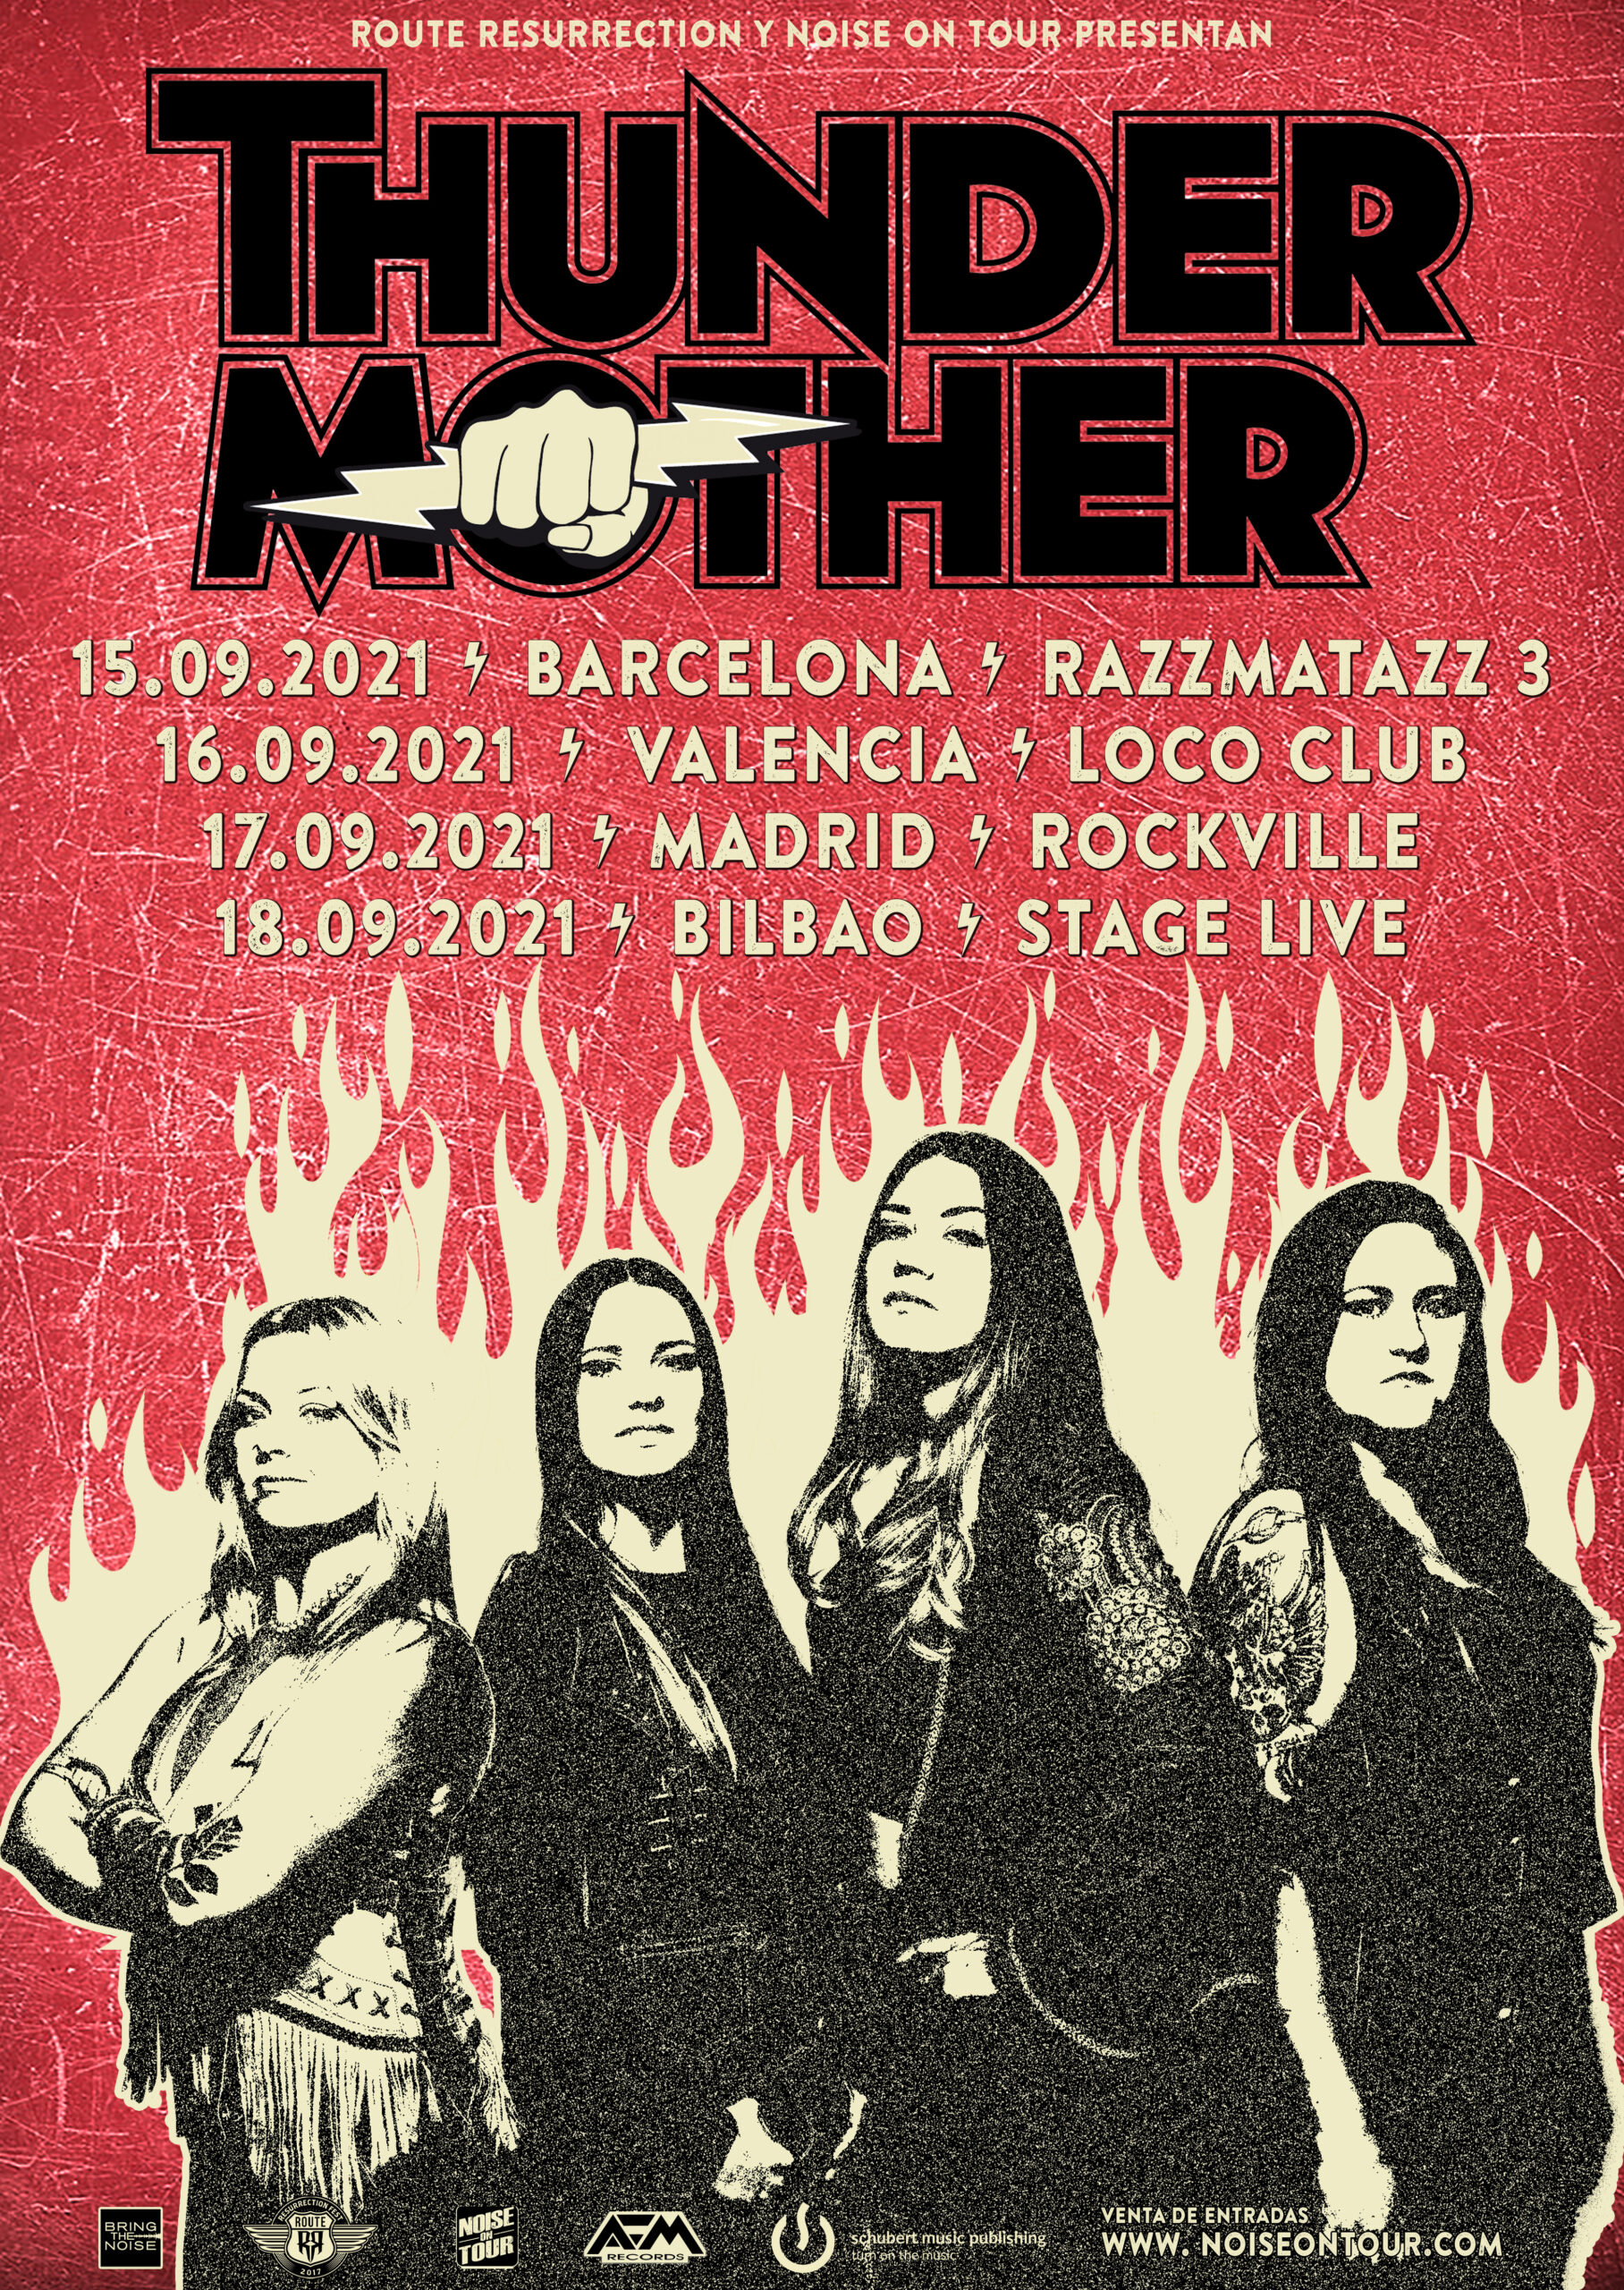 Route Resurrection 2021: Thundermother (Valencia)